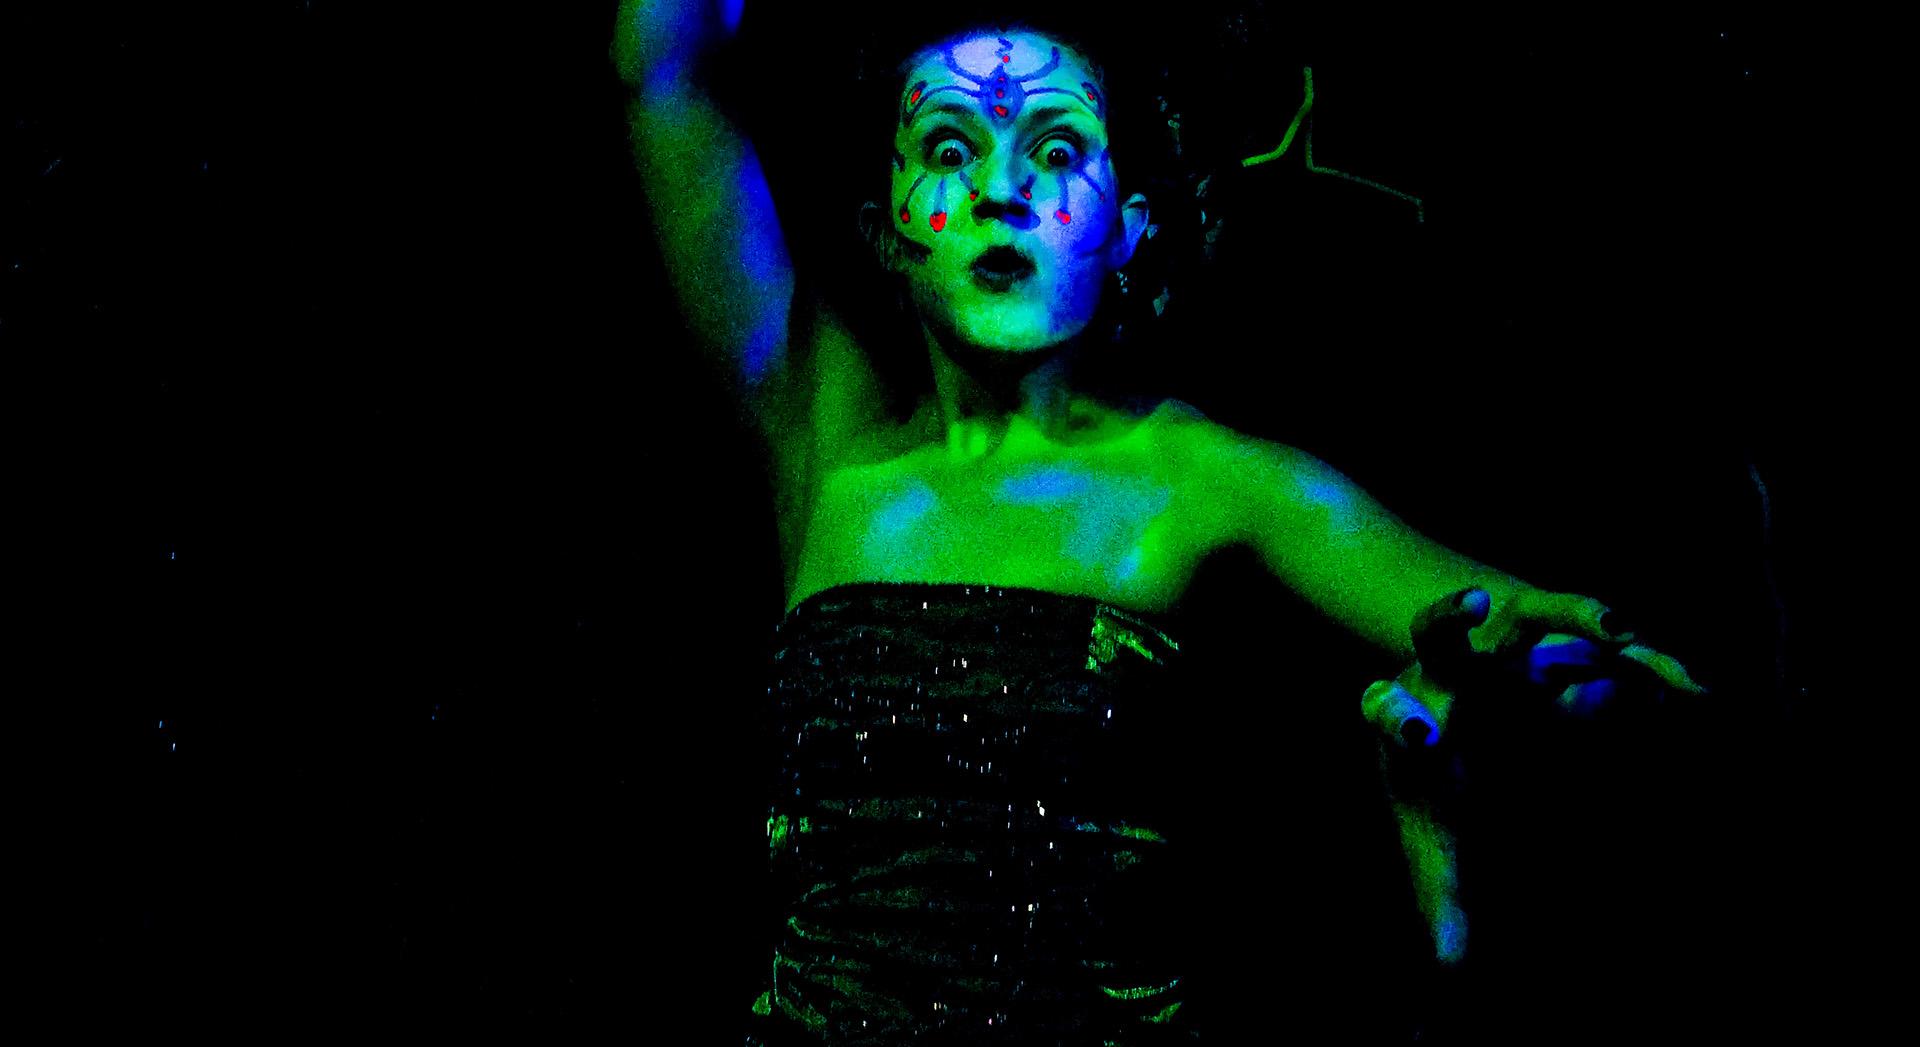 Photo by Brandon Slezak, courtesy of Zombie Joe's Underground Theatre.